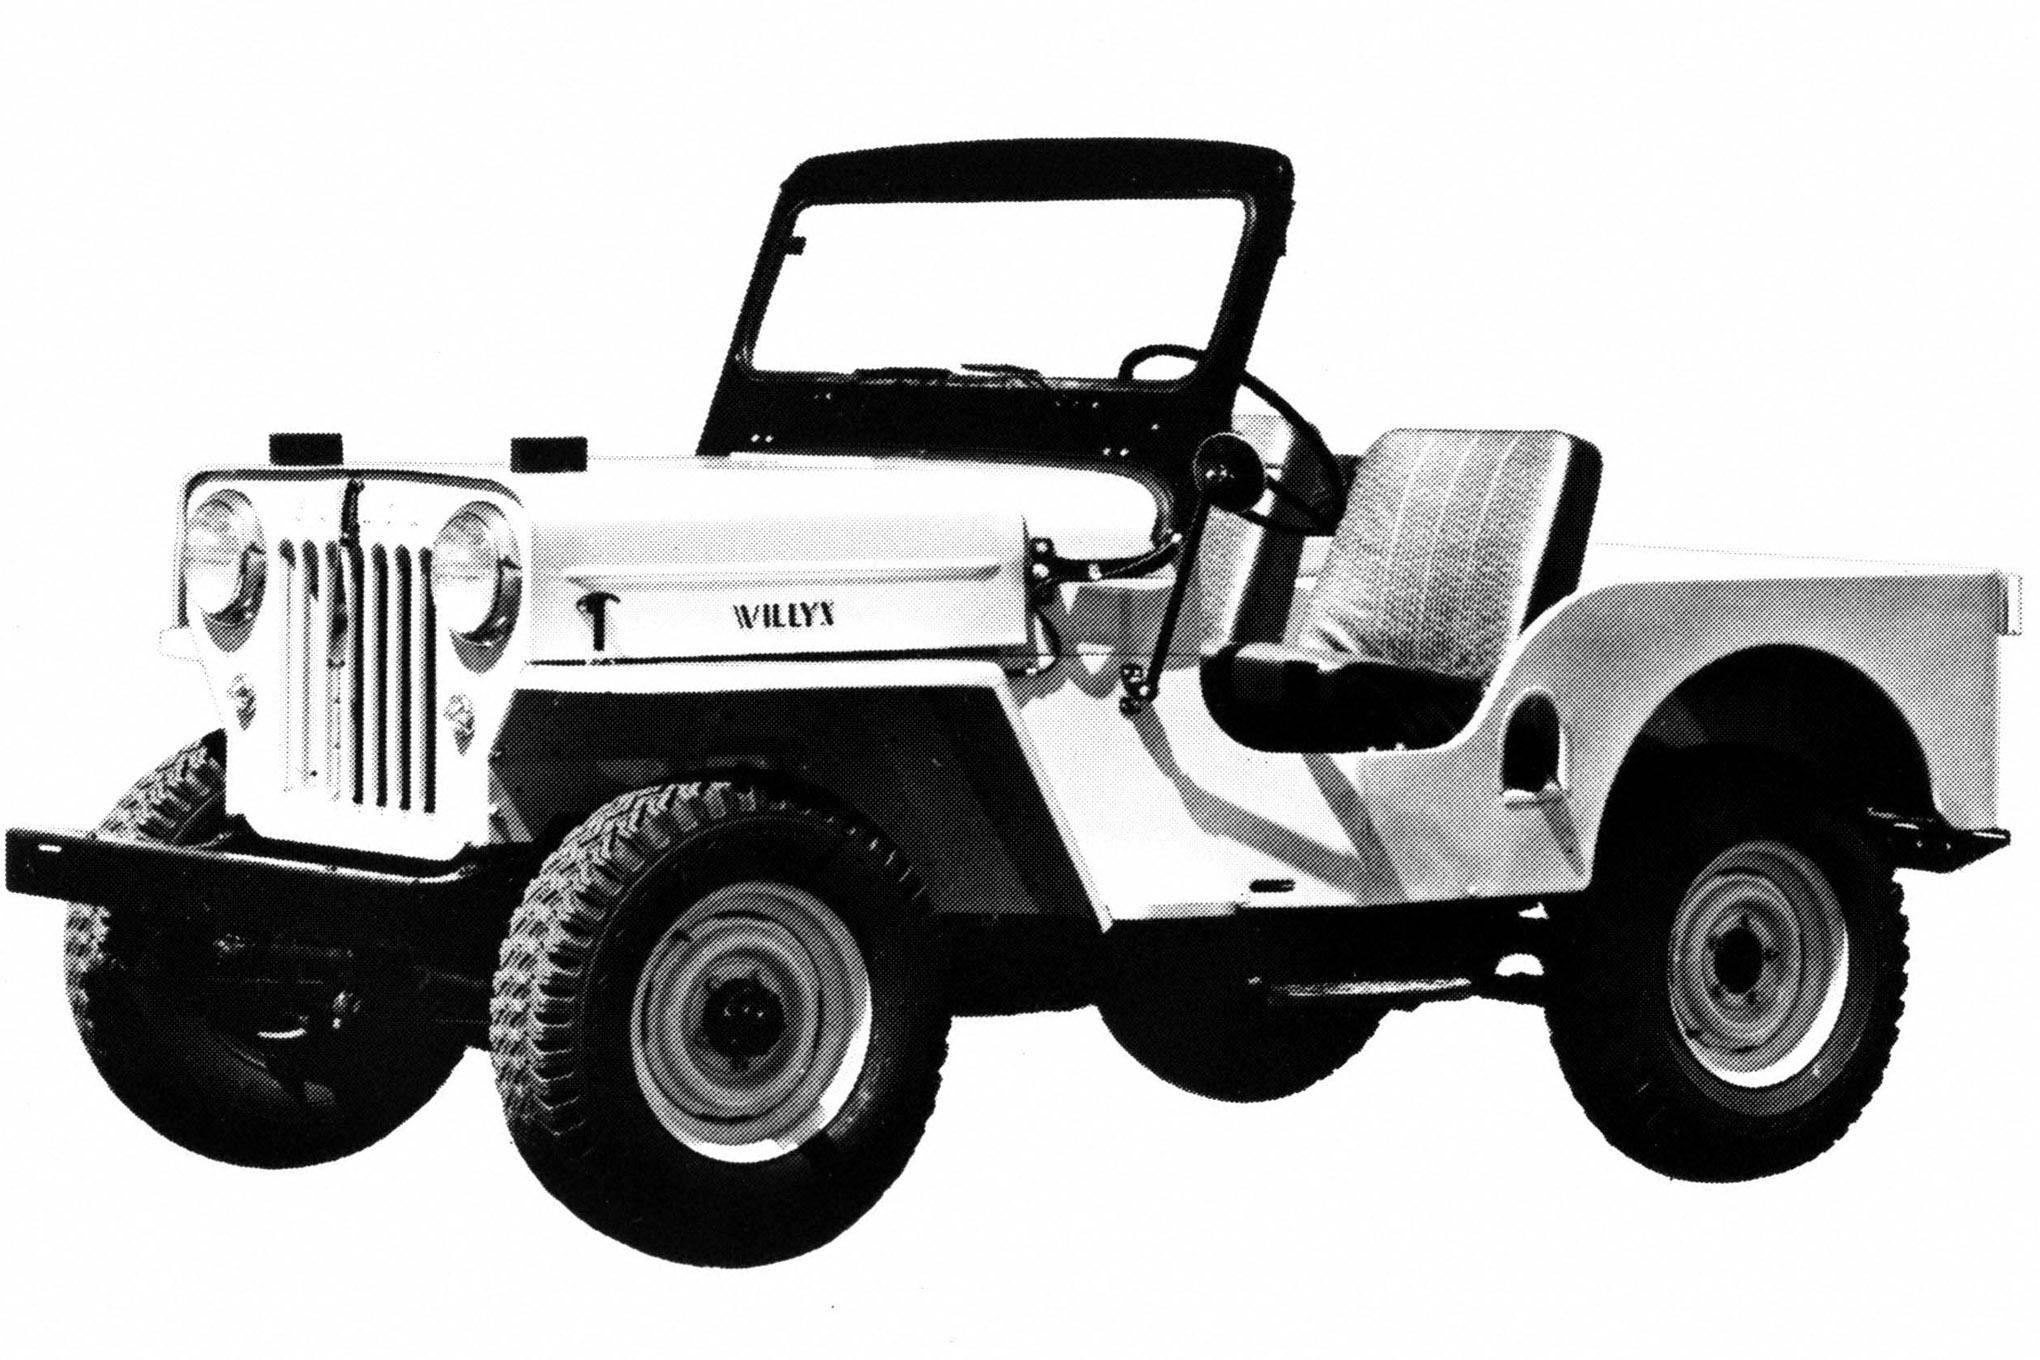 medium resolution of 001 your jeep jeep willys cj3b 3b vintage flatfender high hood